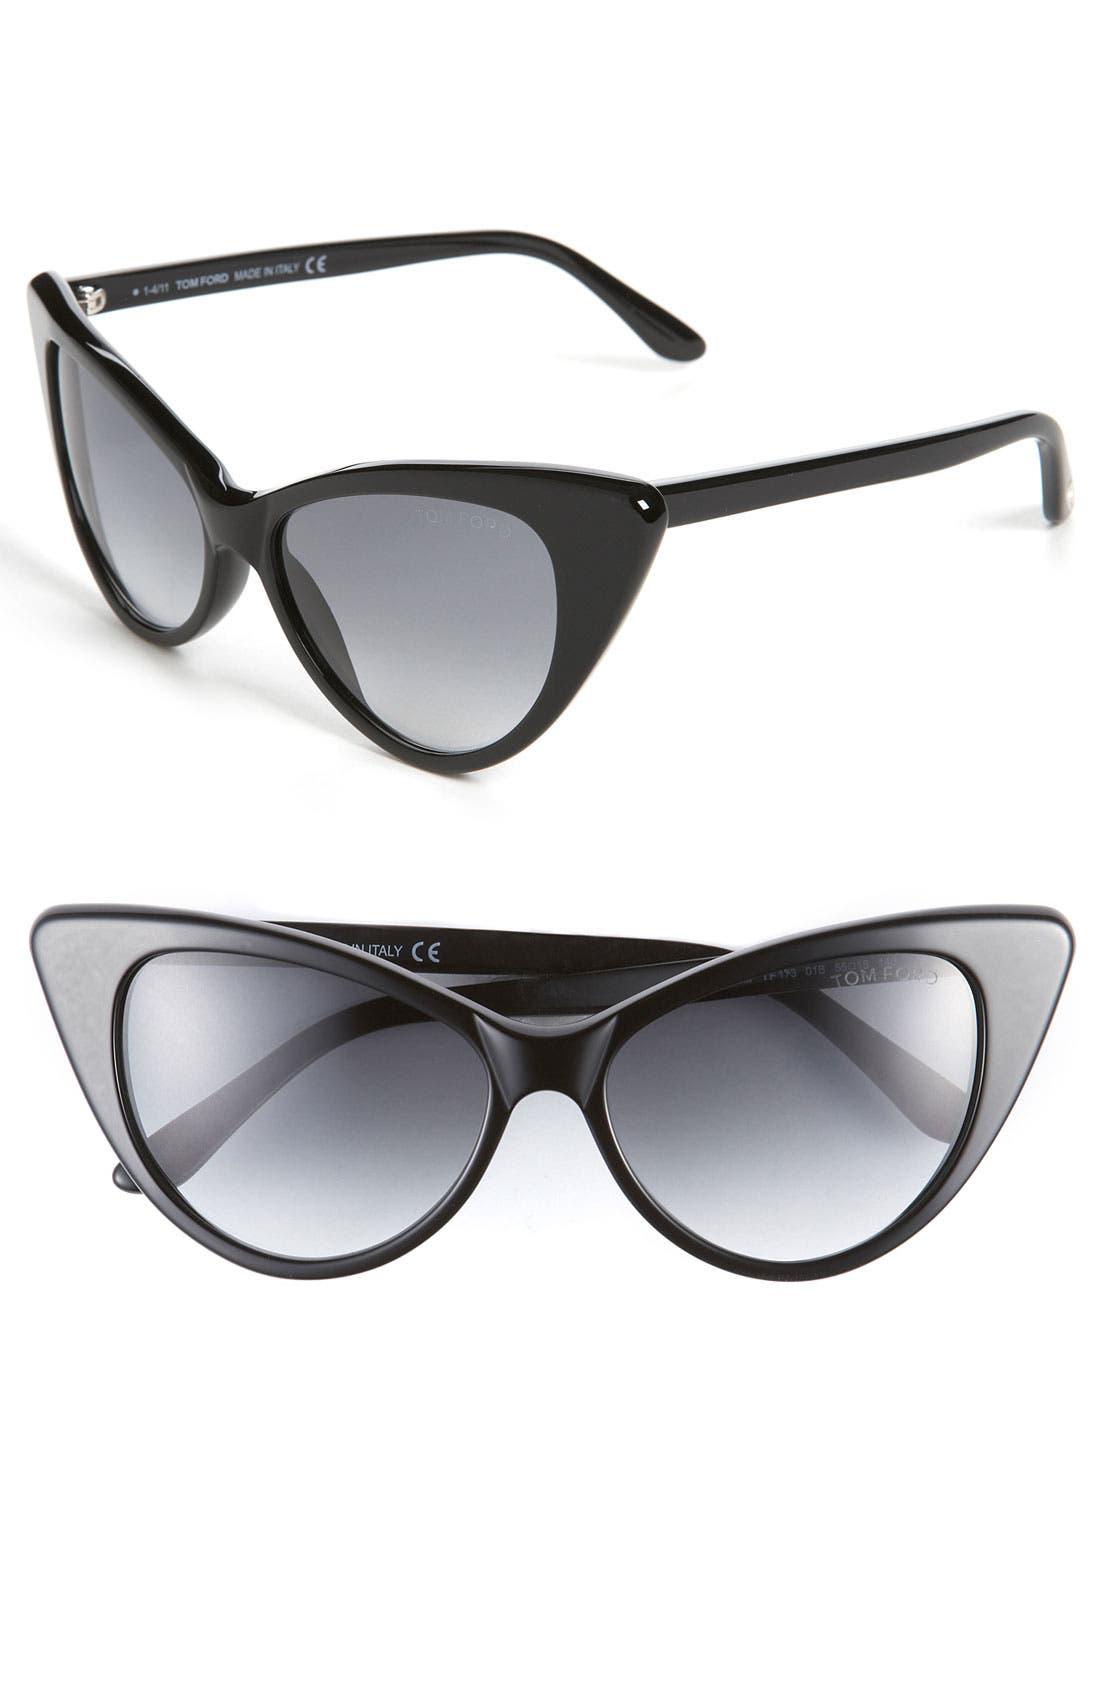 Plastic Cat's Eye Sunglasses,                             Main thumbnail 1, color,                             001